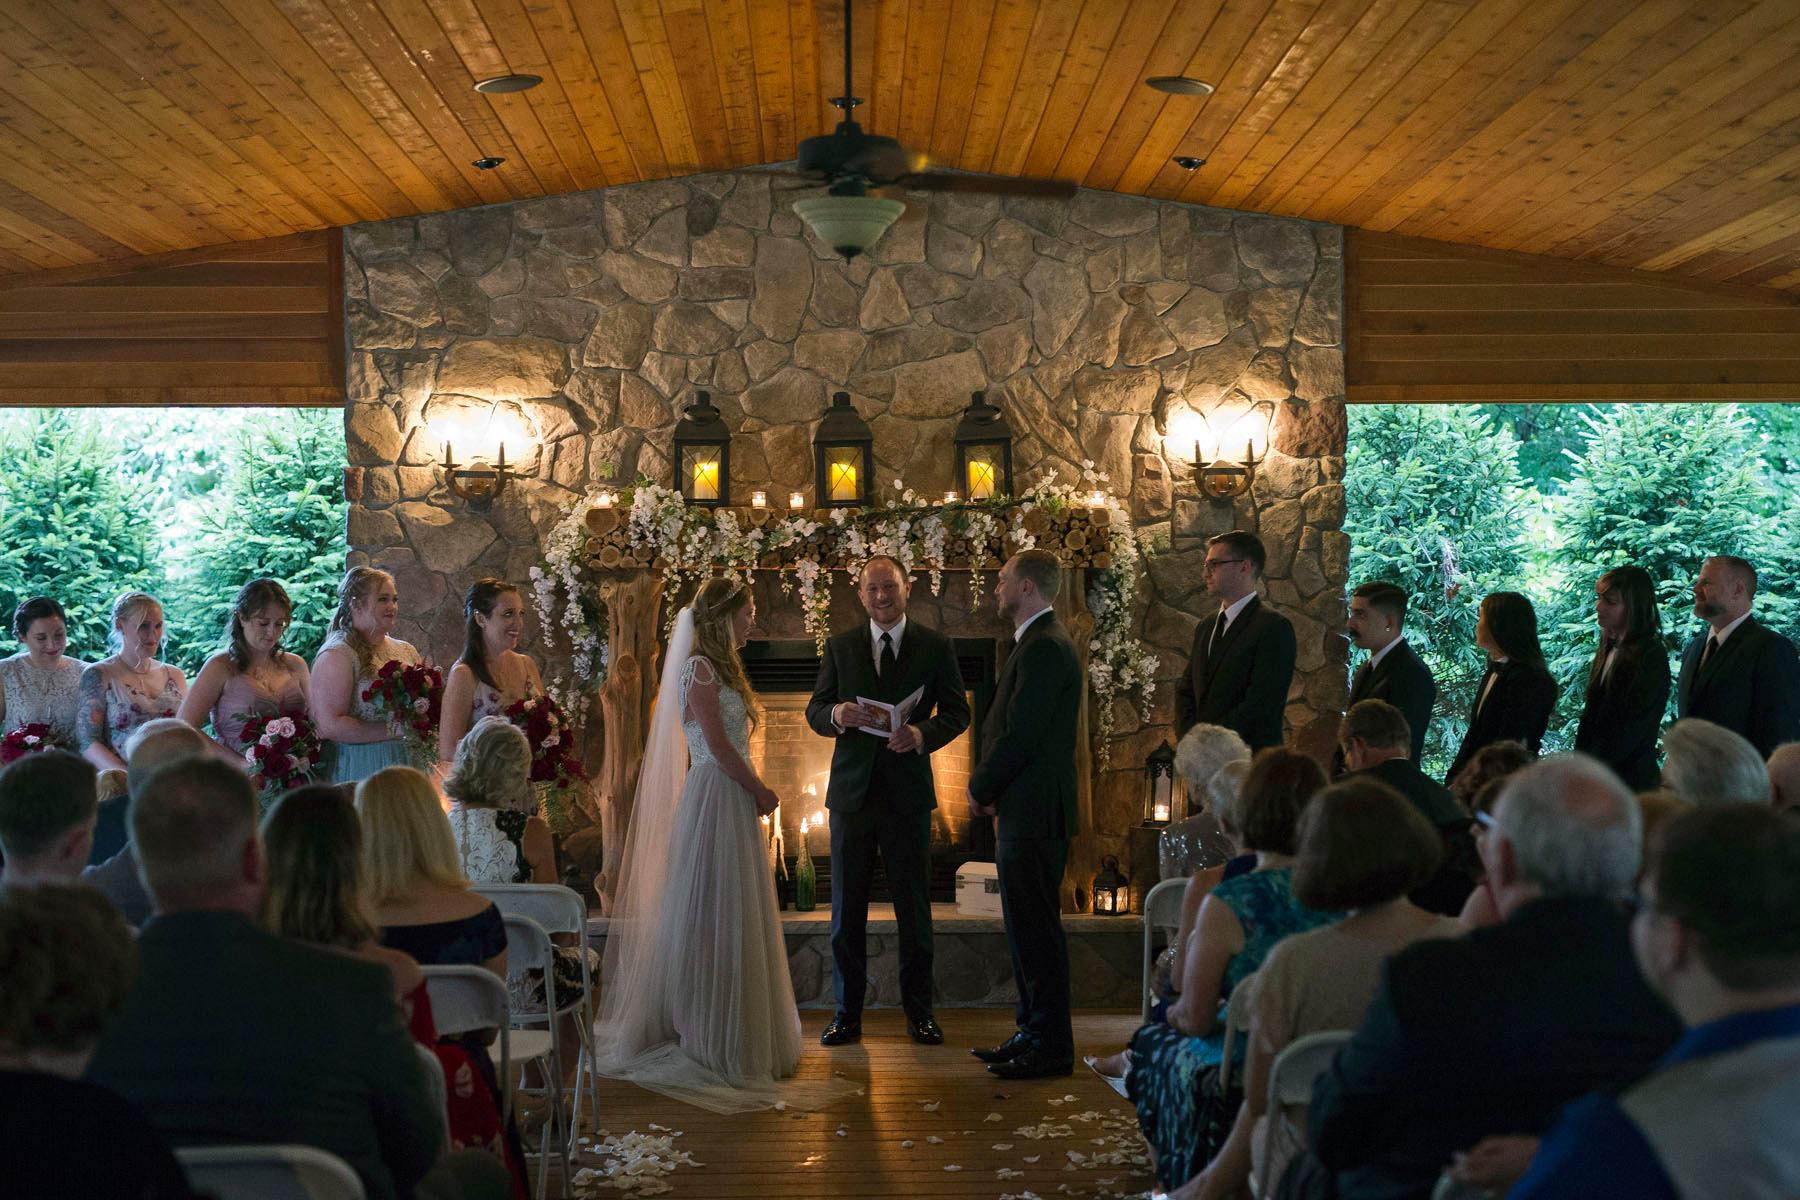 Bucks_County_wedding_photographer_Stroudsmoor_country_inn_wedding_Philadelphia_wedding_photographer_13_stroudsmoor_country_inn_ceremony.JPG